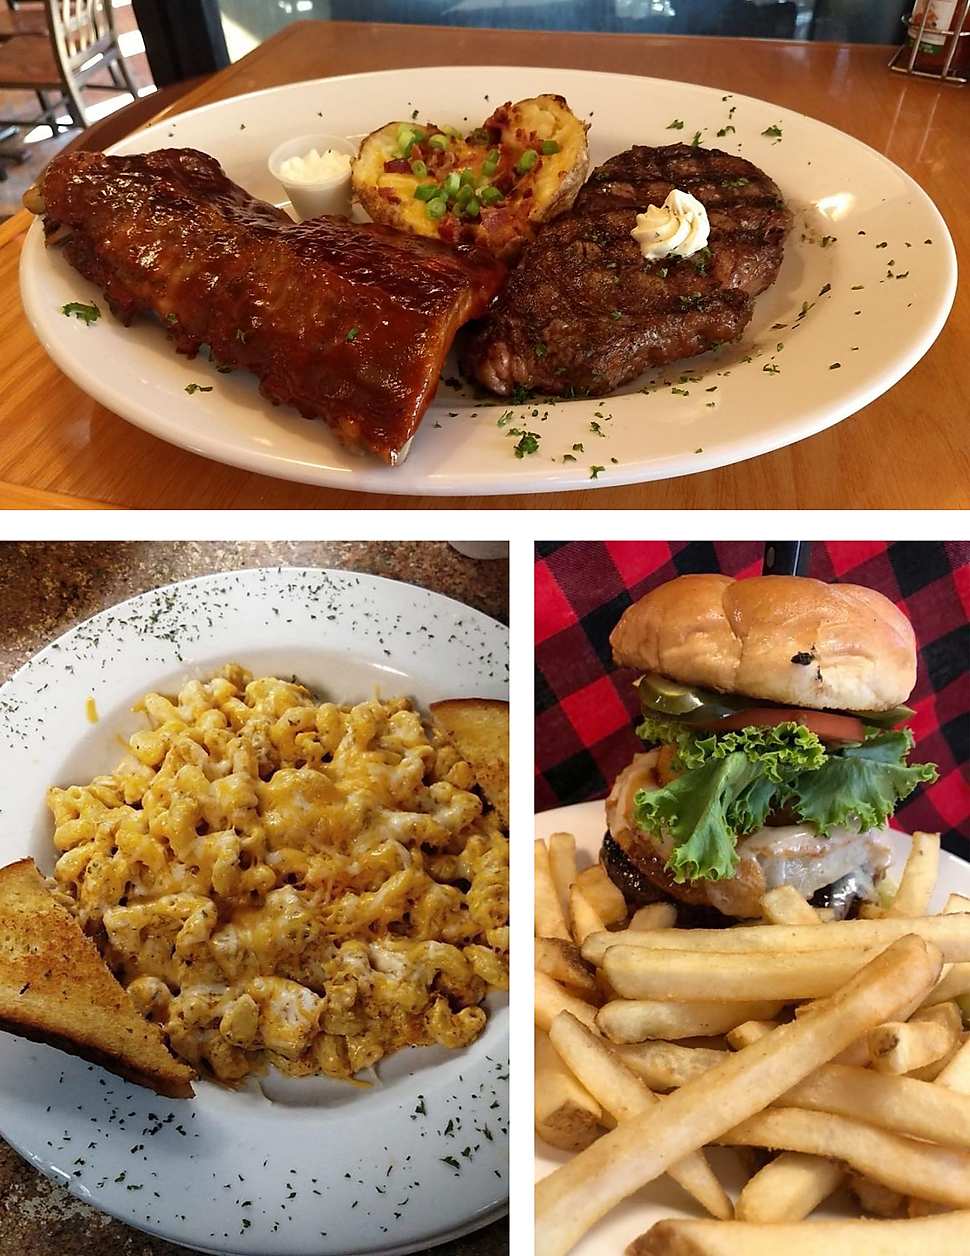 Up North Lodge Ribs salad bar restaurant menu bar wine list hours location deals Marquette Now